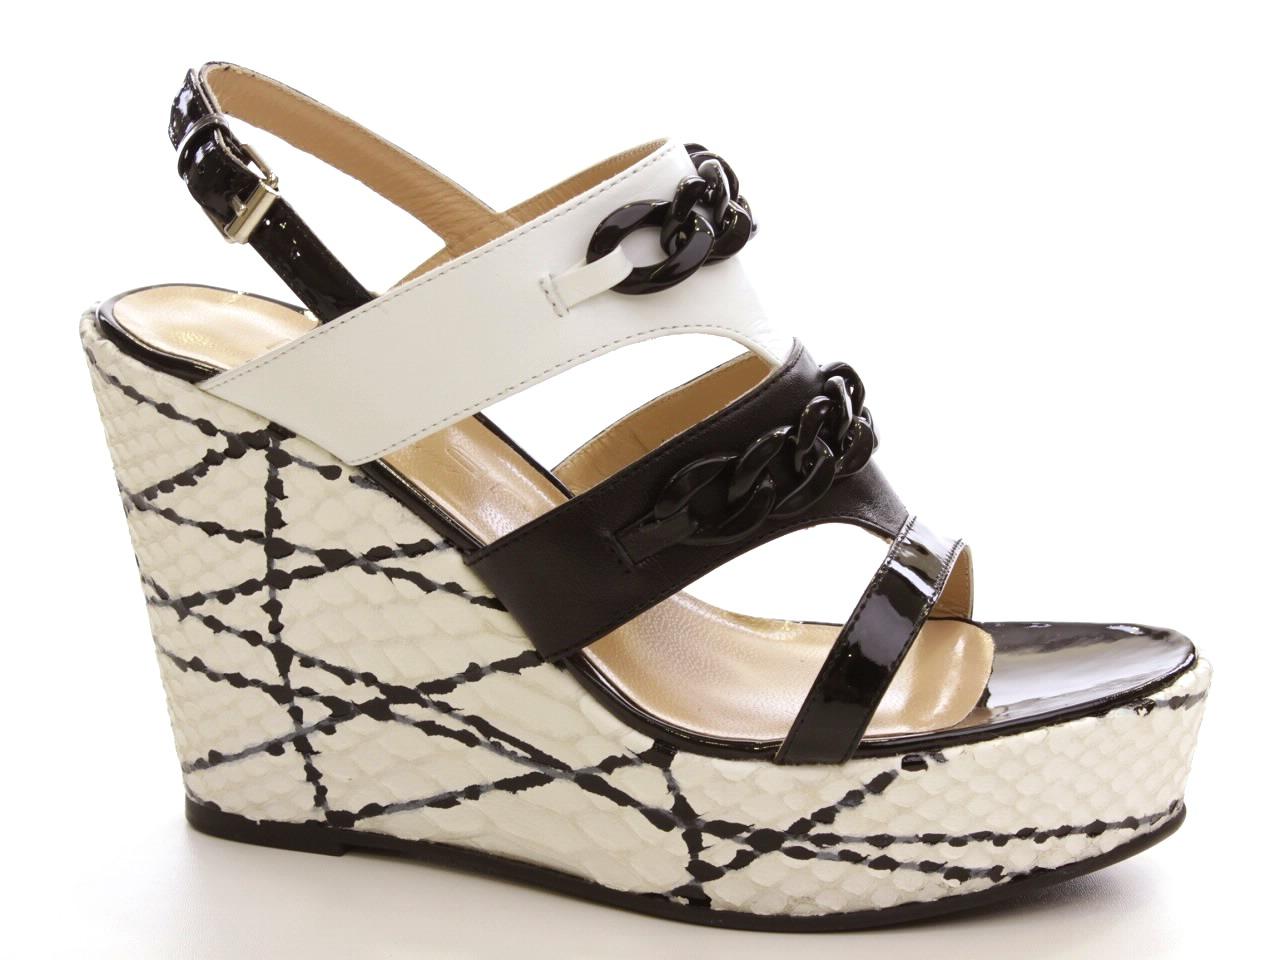 Wedge Sandals Helsar - 032 105